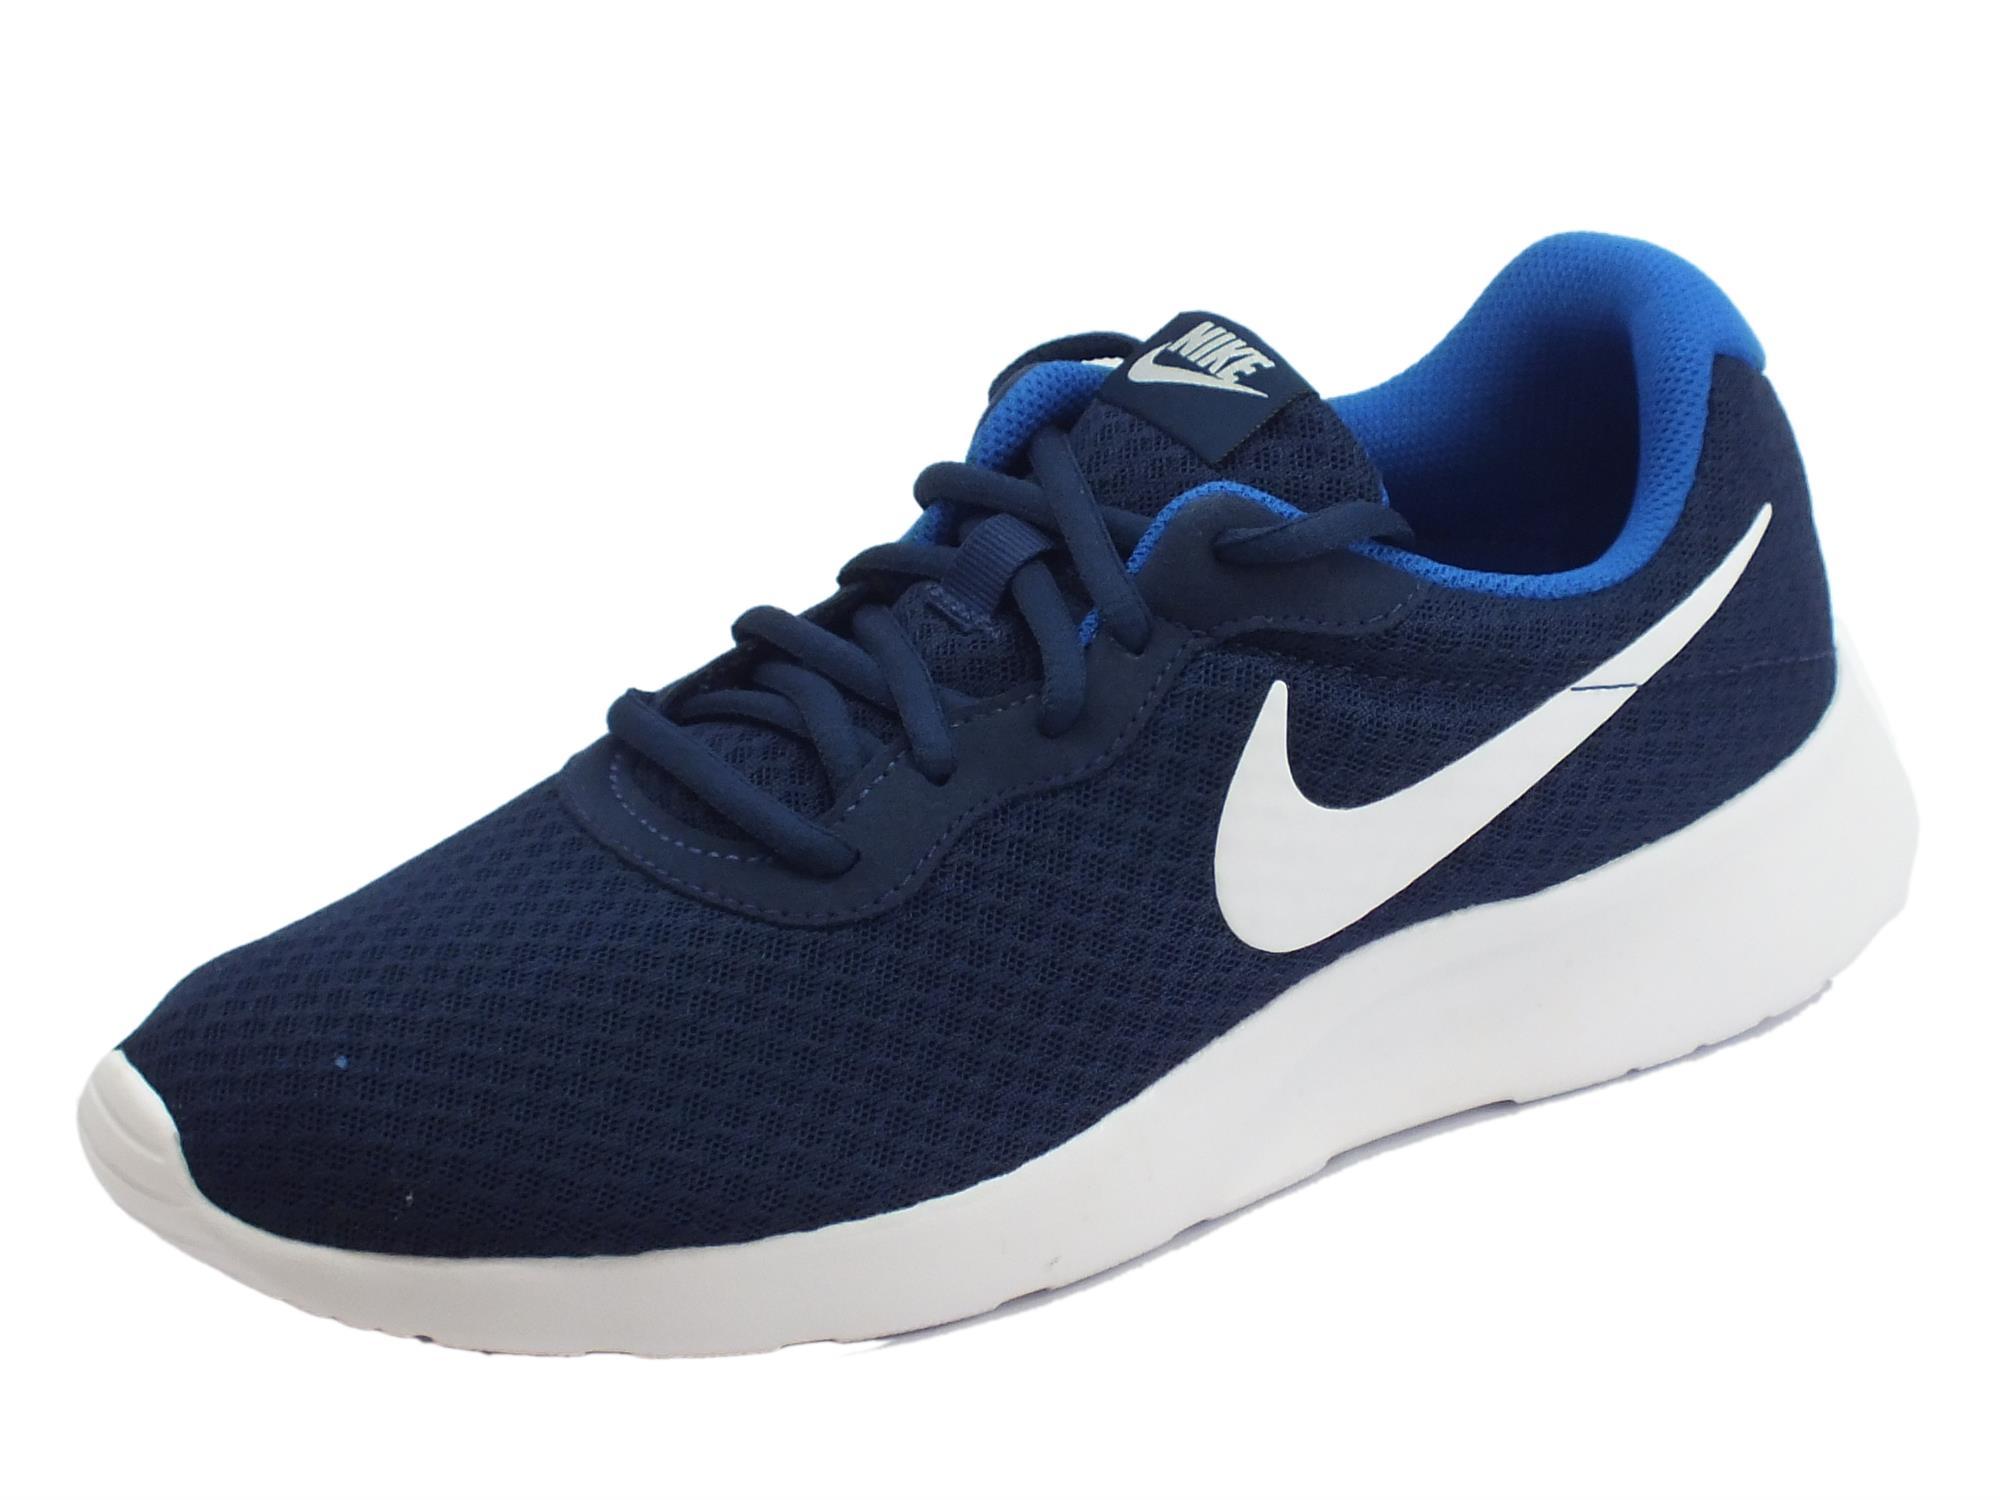 Scarpe sportive Nike Tanjun per uomo in tessuto blu scuro